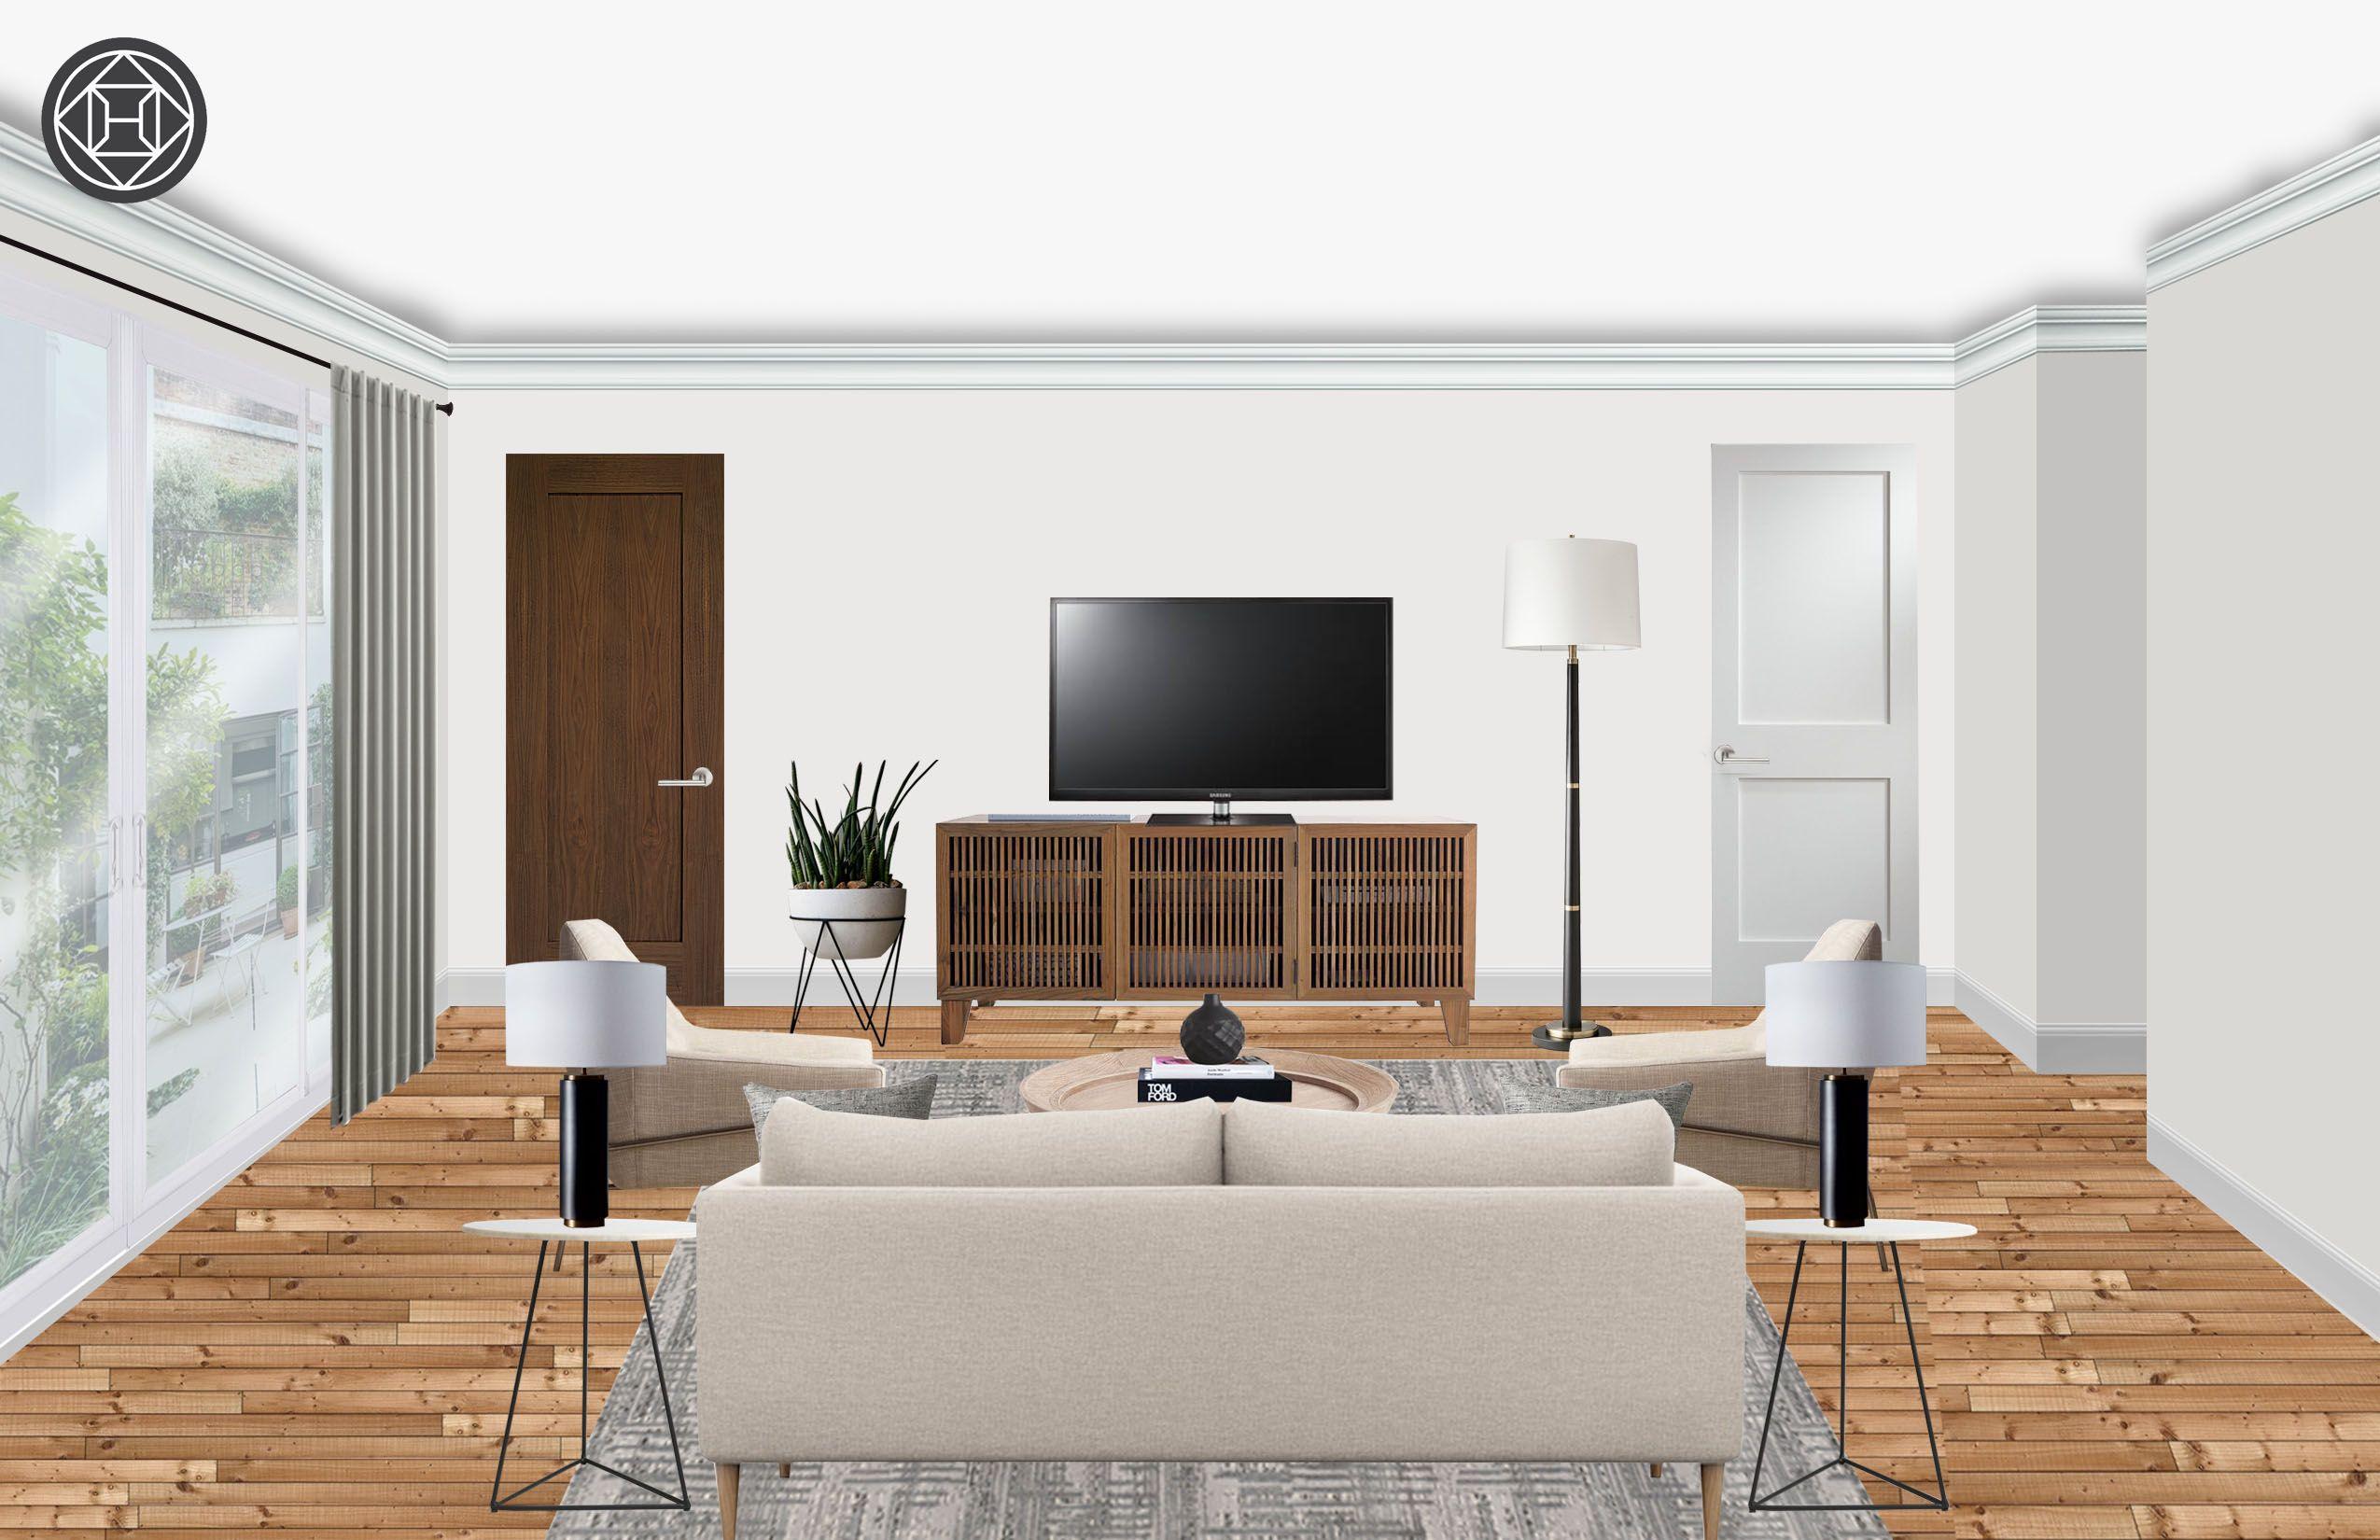 Transitional Living Room Decor Transitional Living Room Design ...